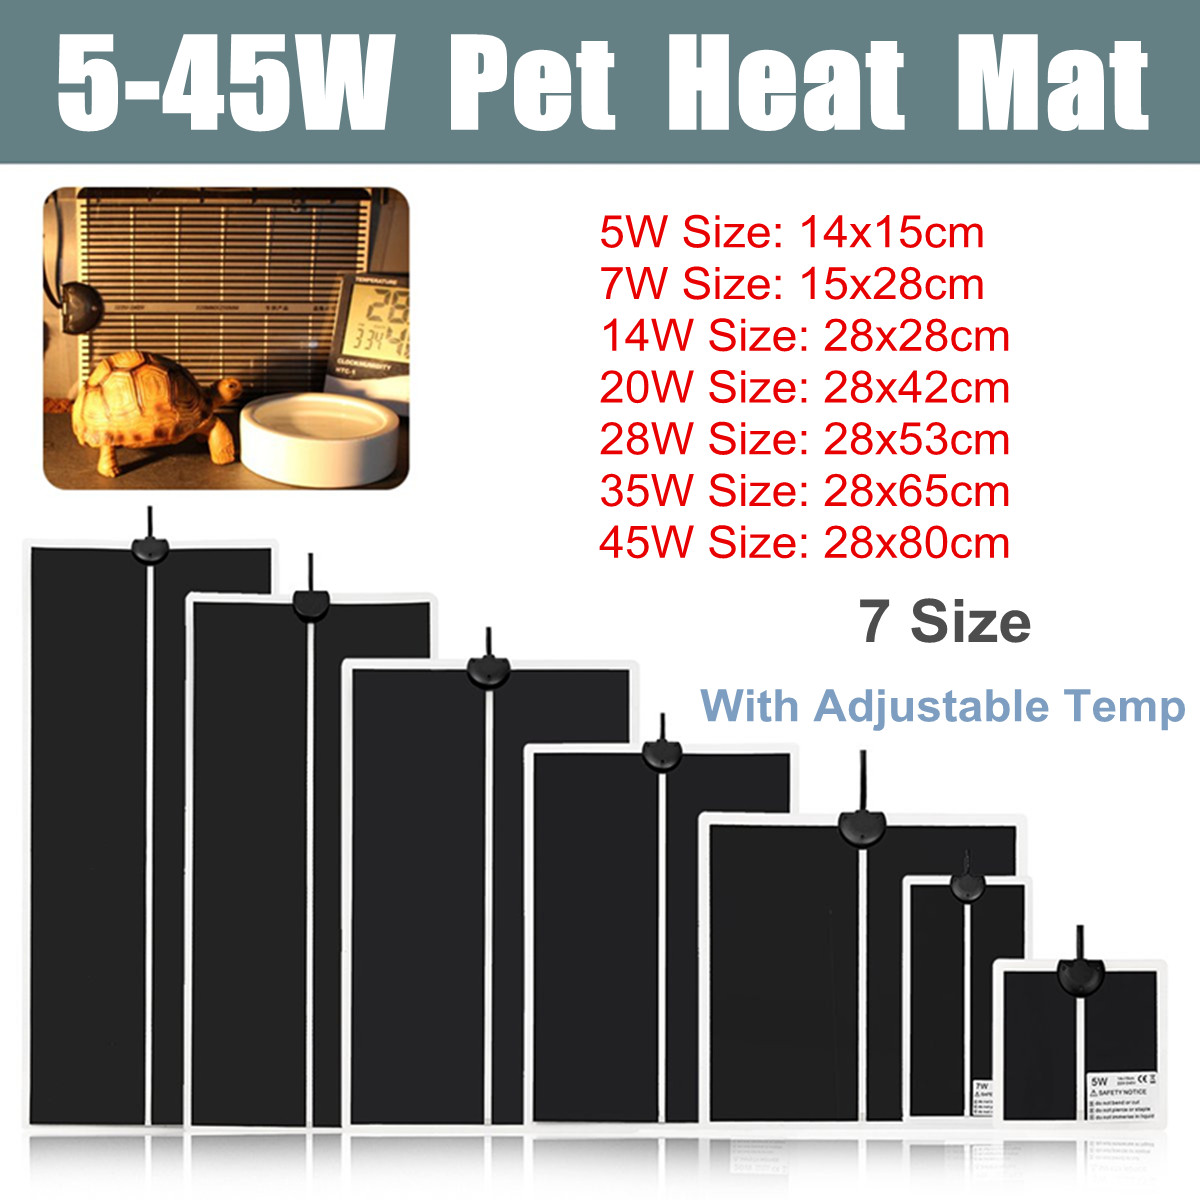 5-45 W terrario Reptiles calor Mat escalada para calefacción caliente almohadillas ajustable controlador de temperatura de los Reptiles suministros